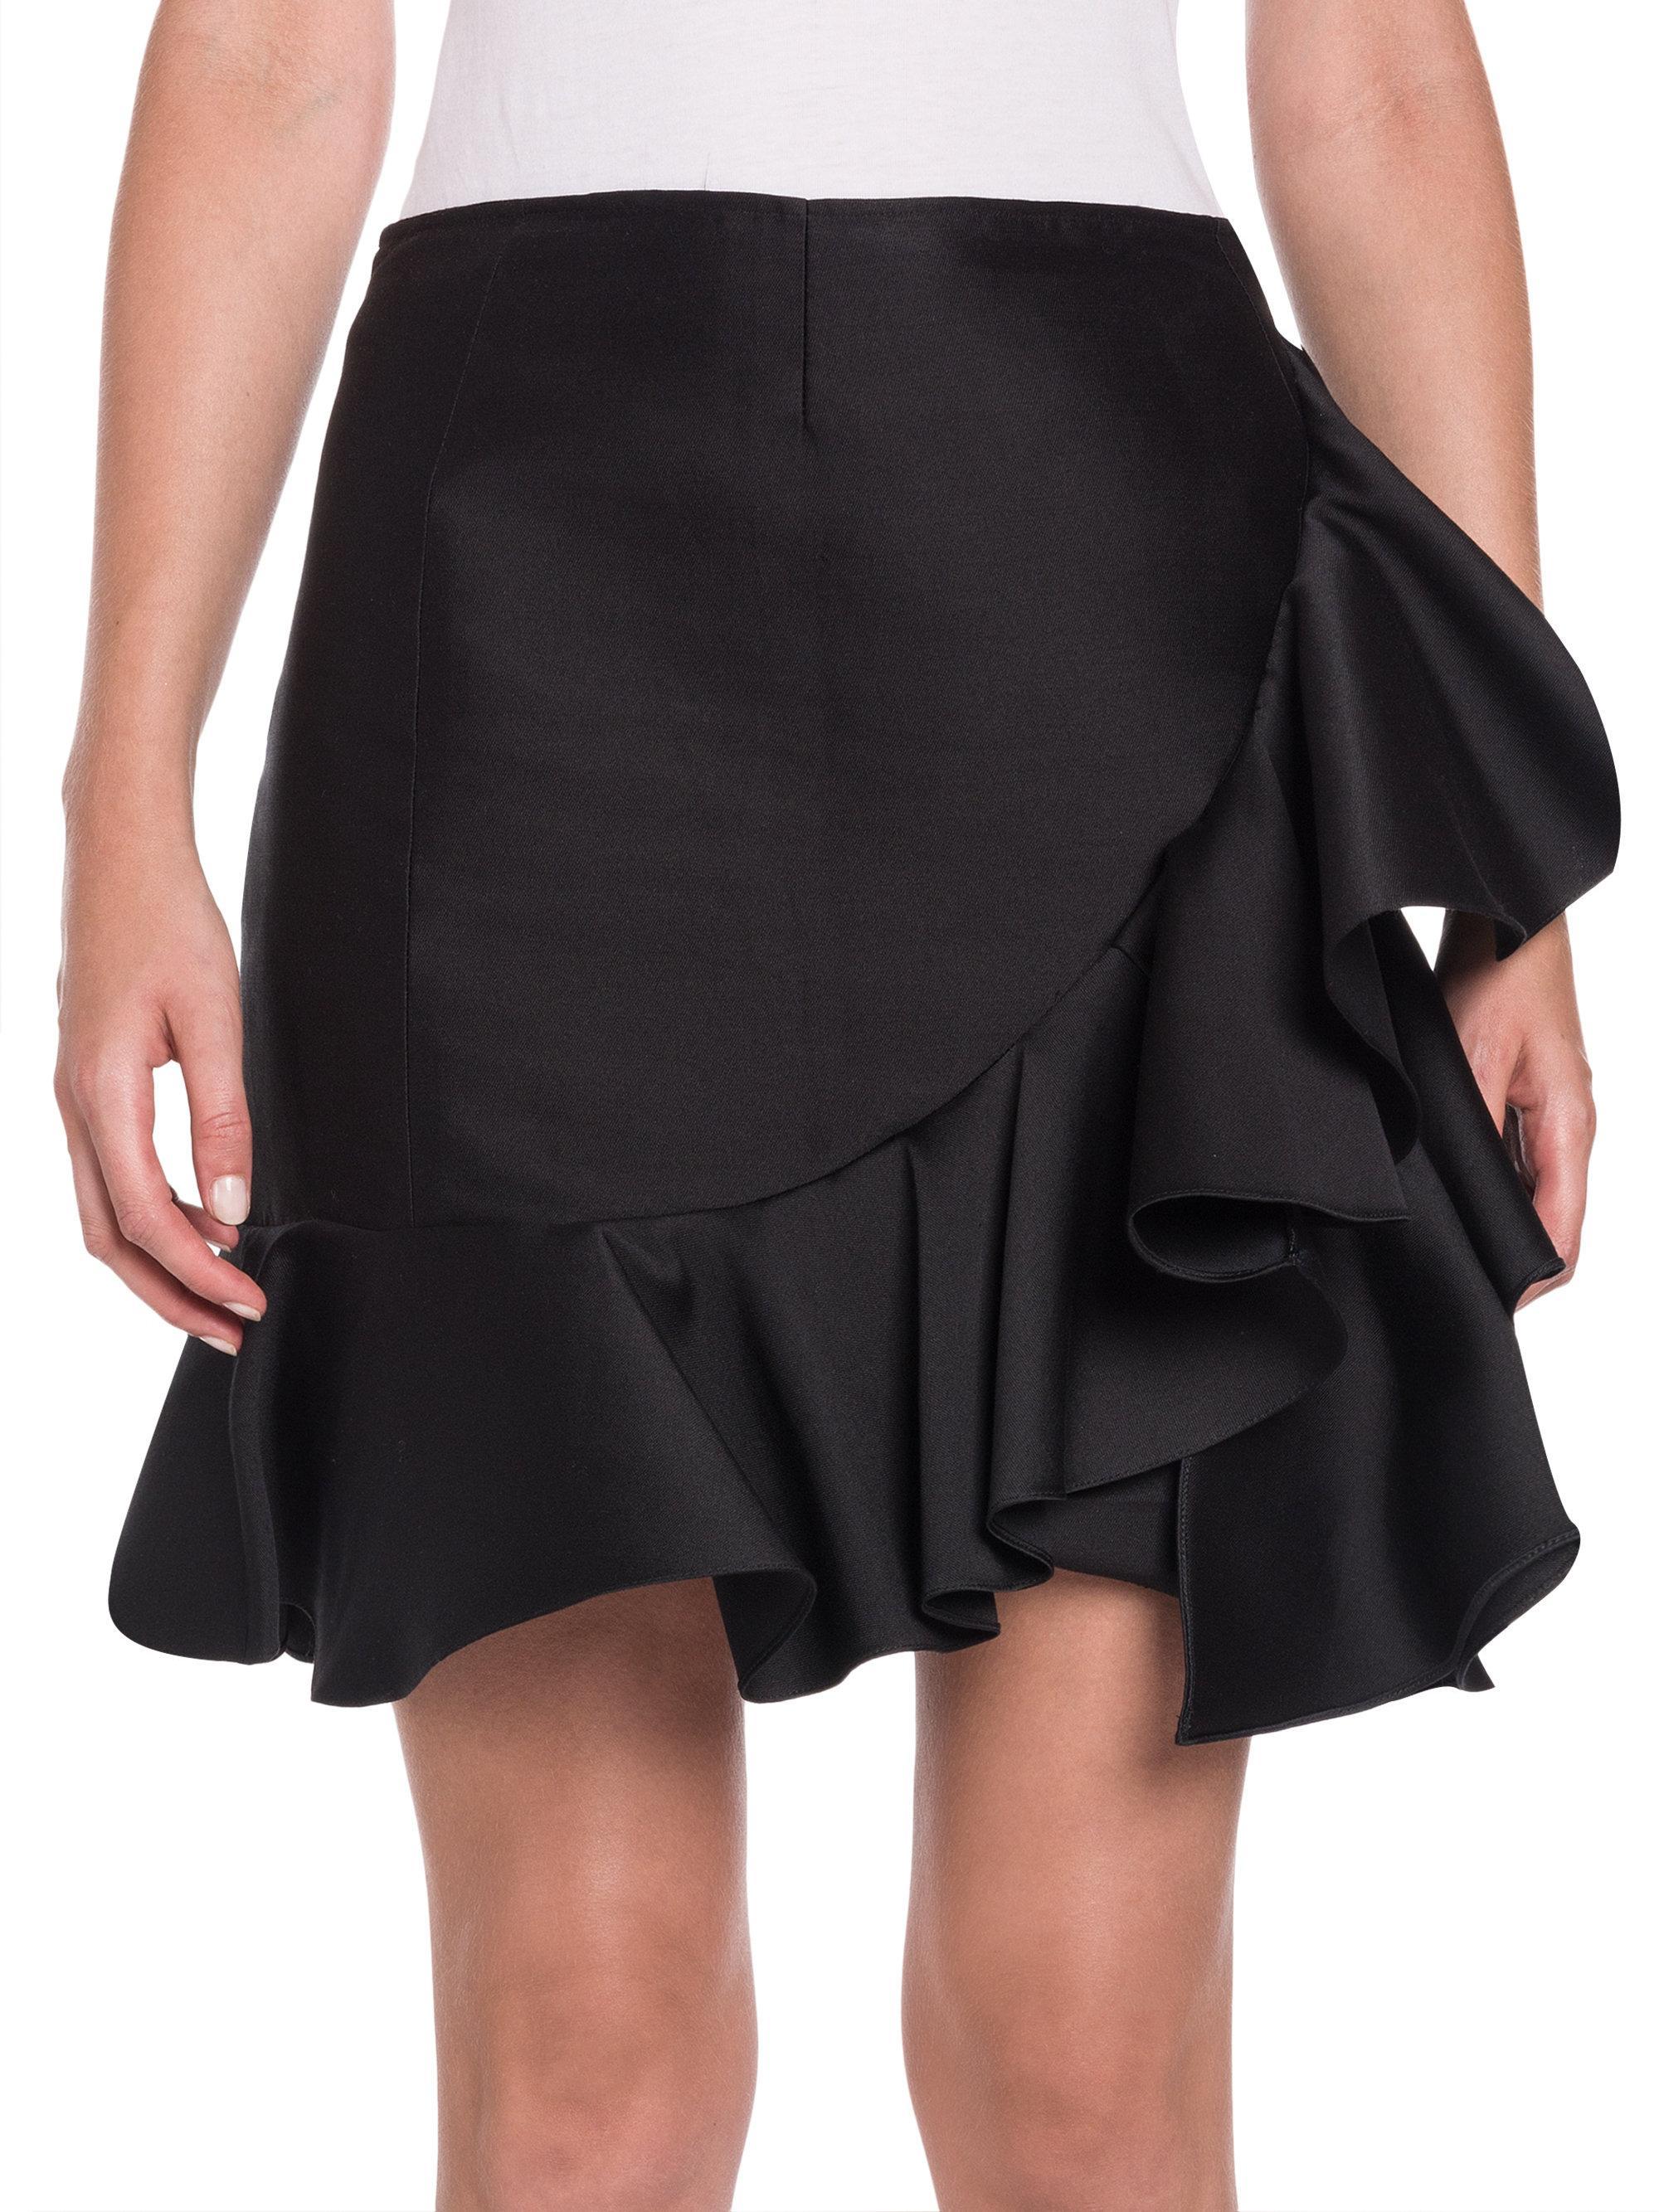 ruffled mini skirt - Black Stella McCartney Cheap Low Shipping Fee Enjoy Sale Online PNqVu70eR